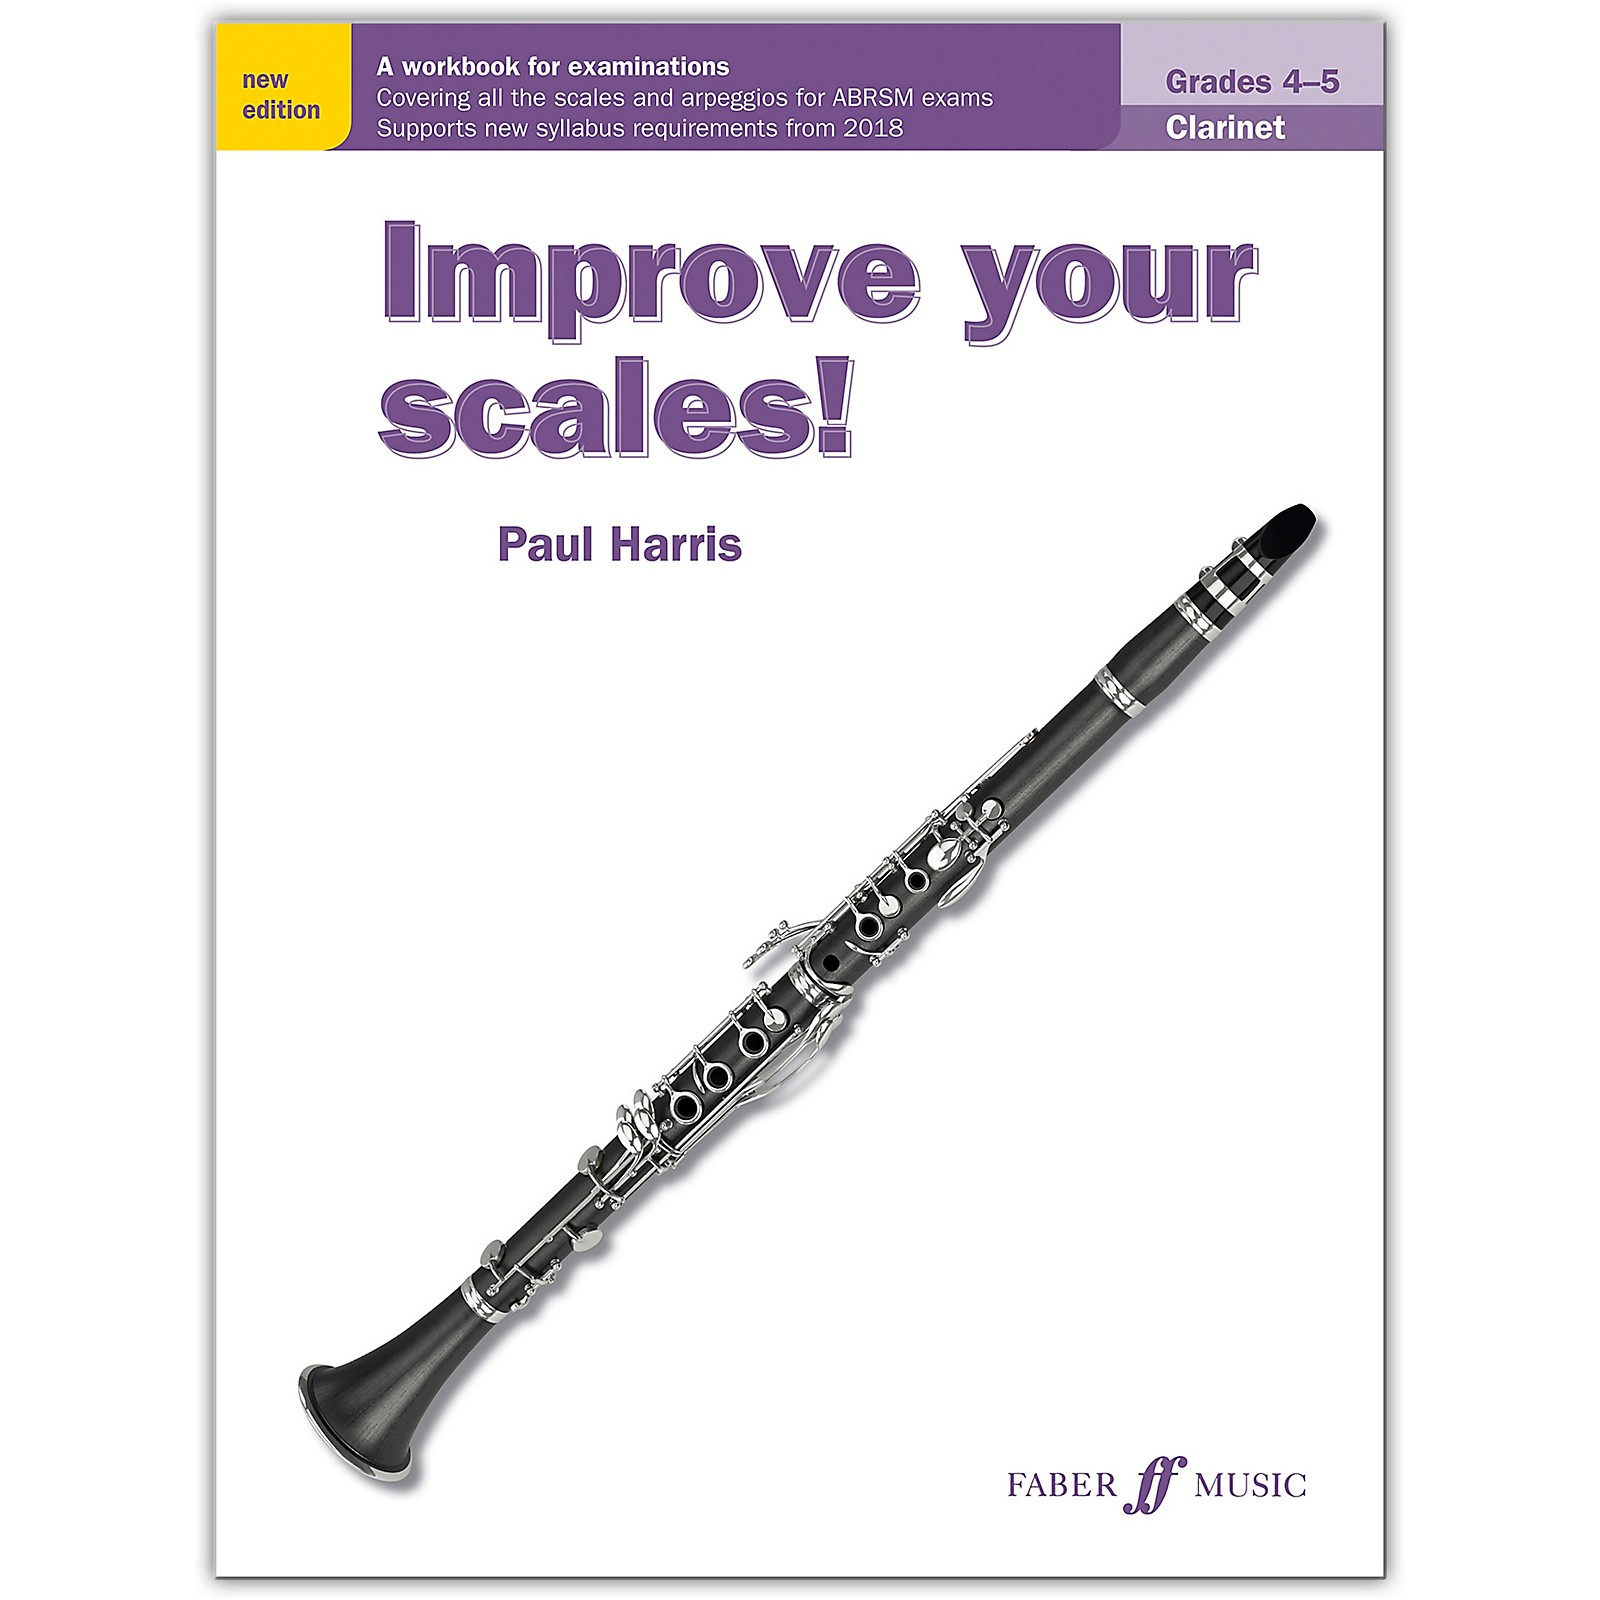 Faber Music LTD Improve Your Scales! Clarinet, Grades 4-5